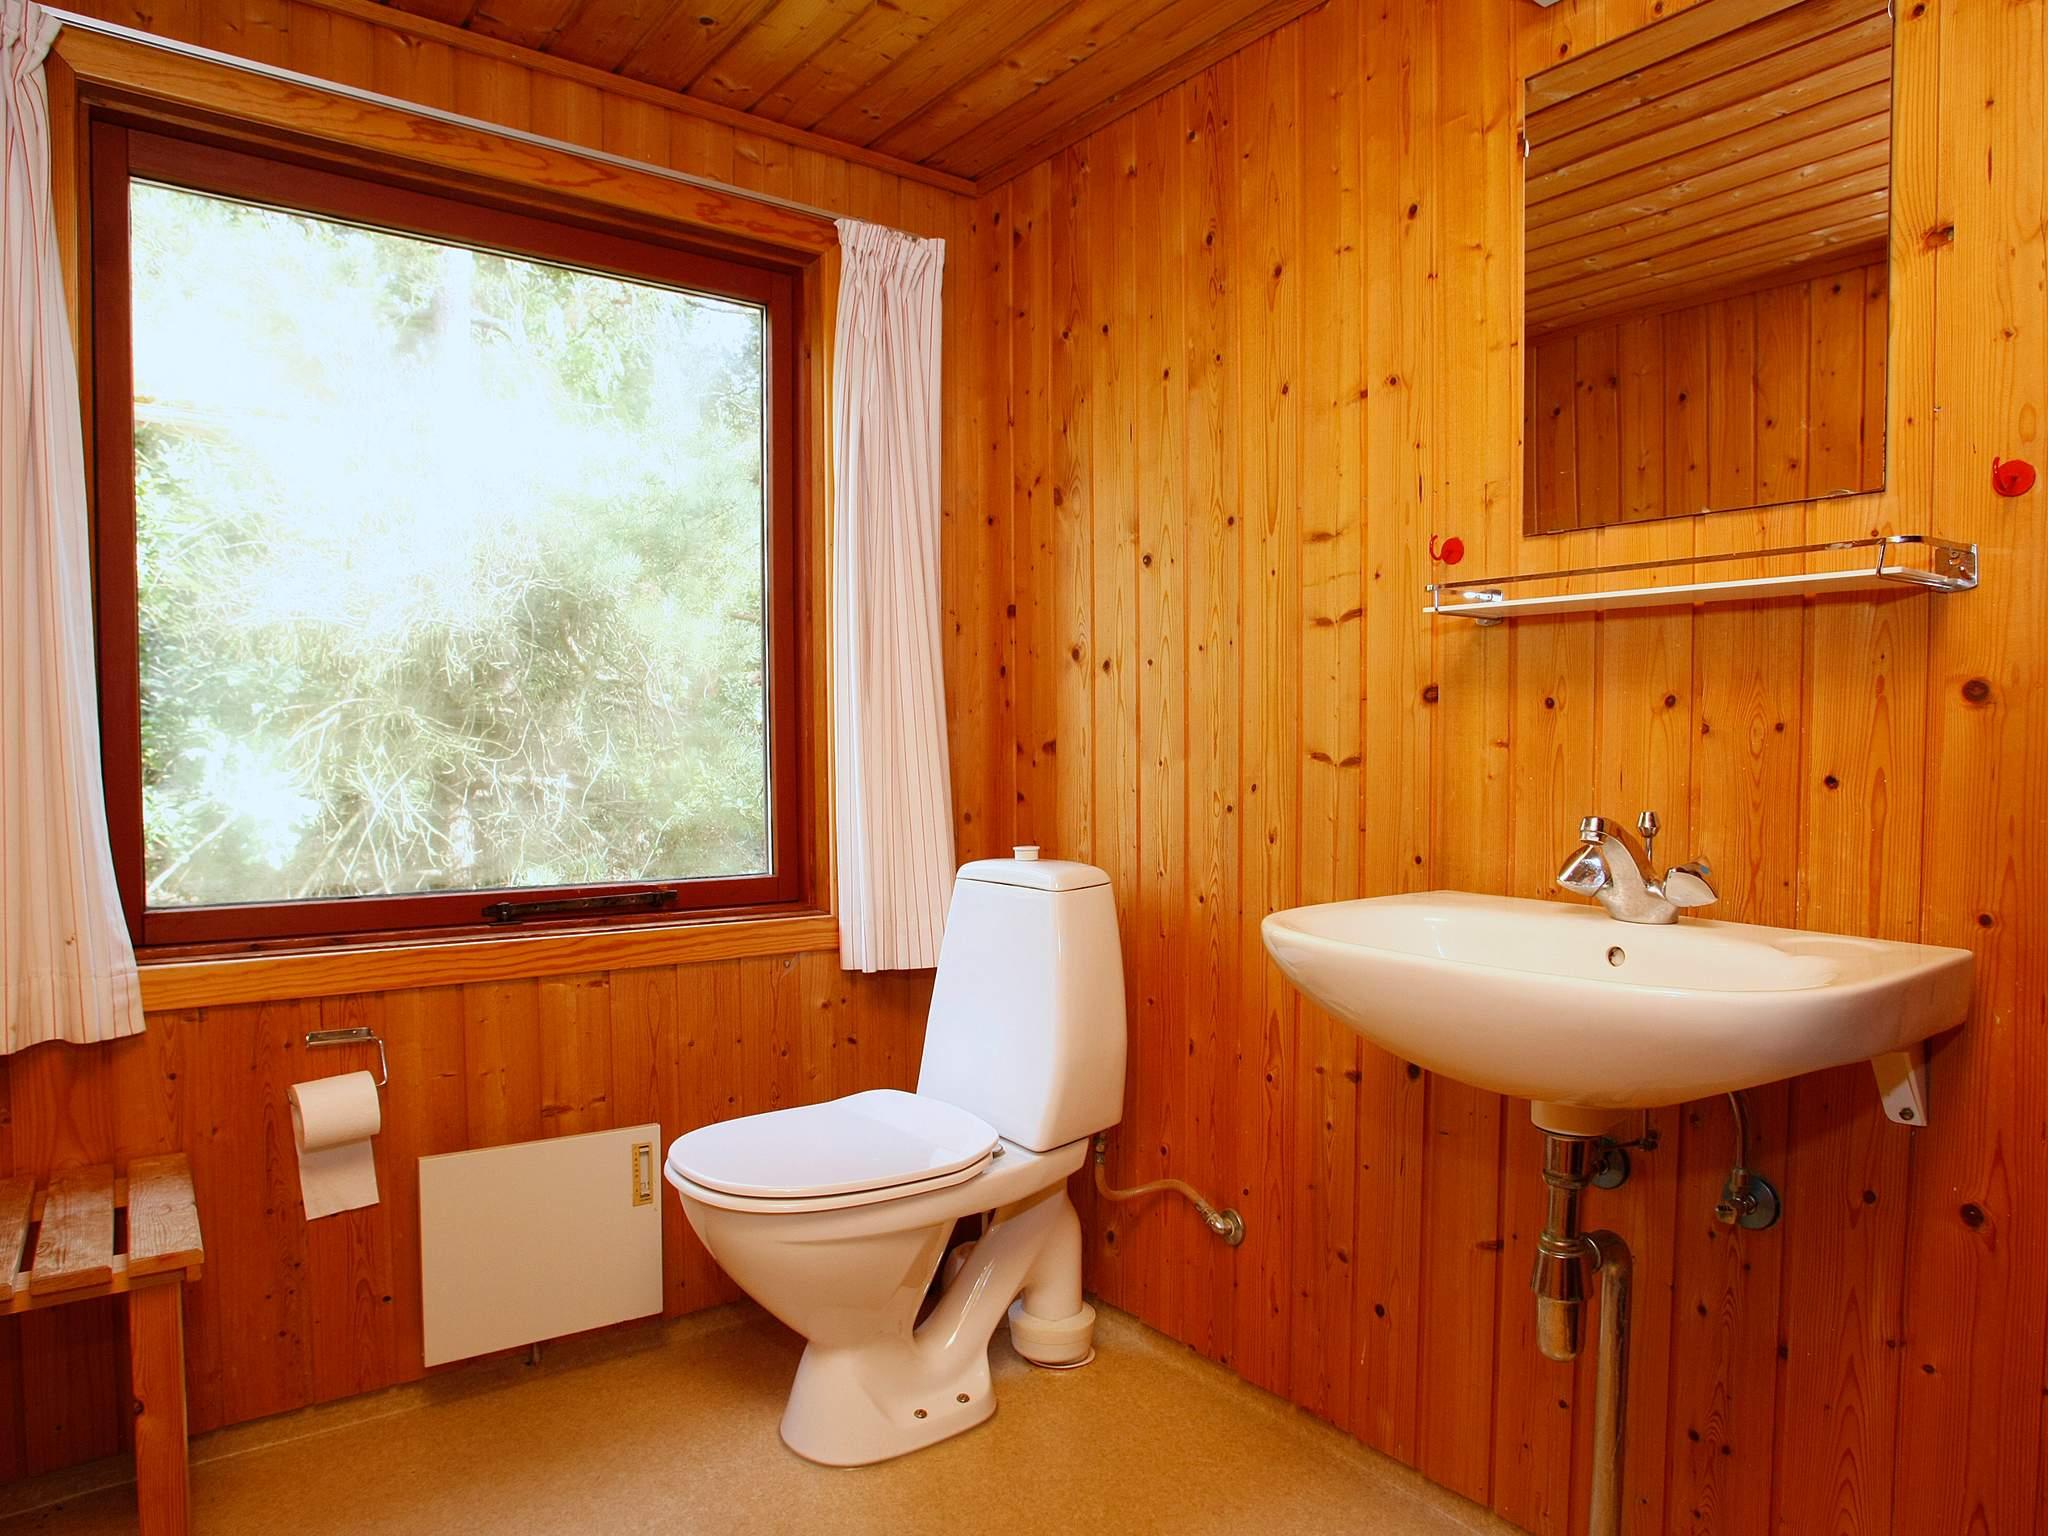 Ferienhaus Læsø/Vesterø (88181), Læsø, , Læsø, Dänemark, Bild 1